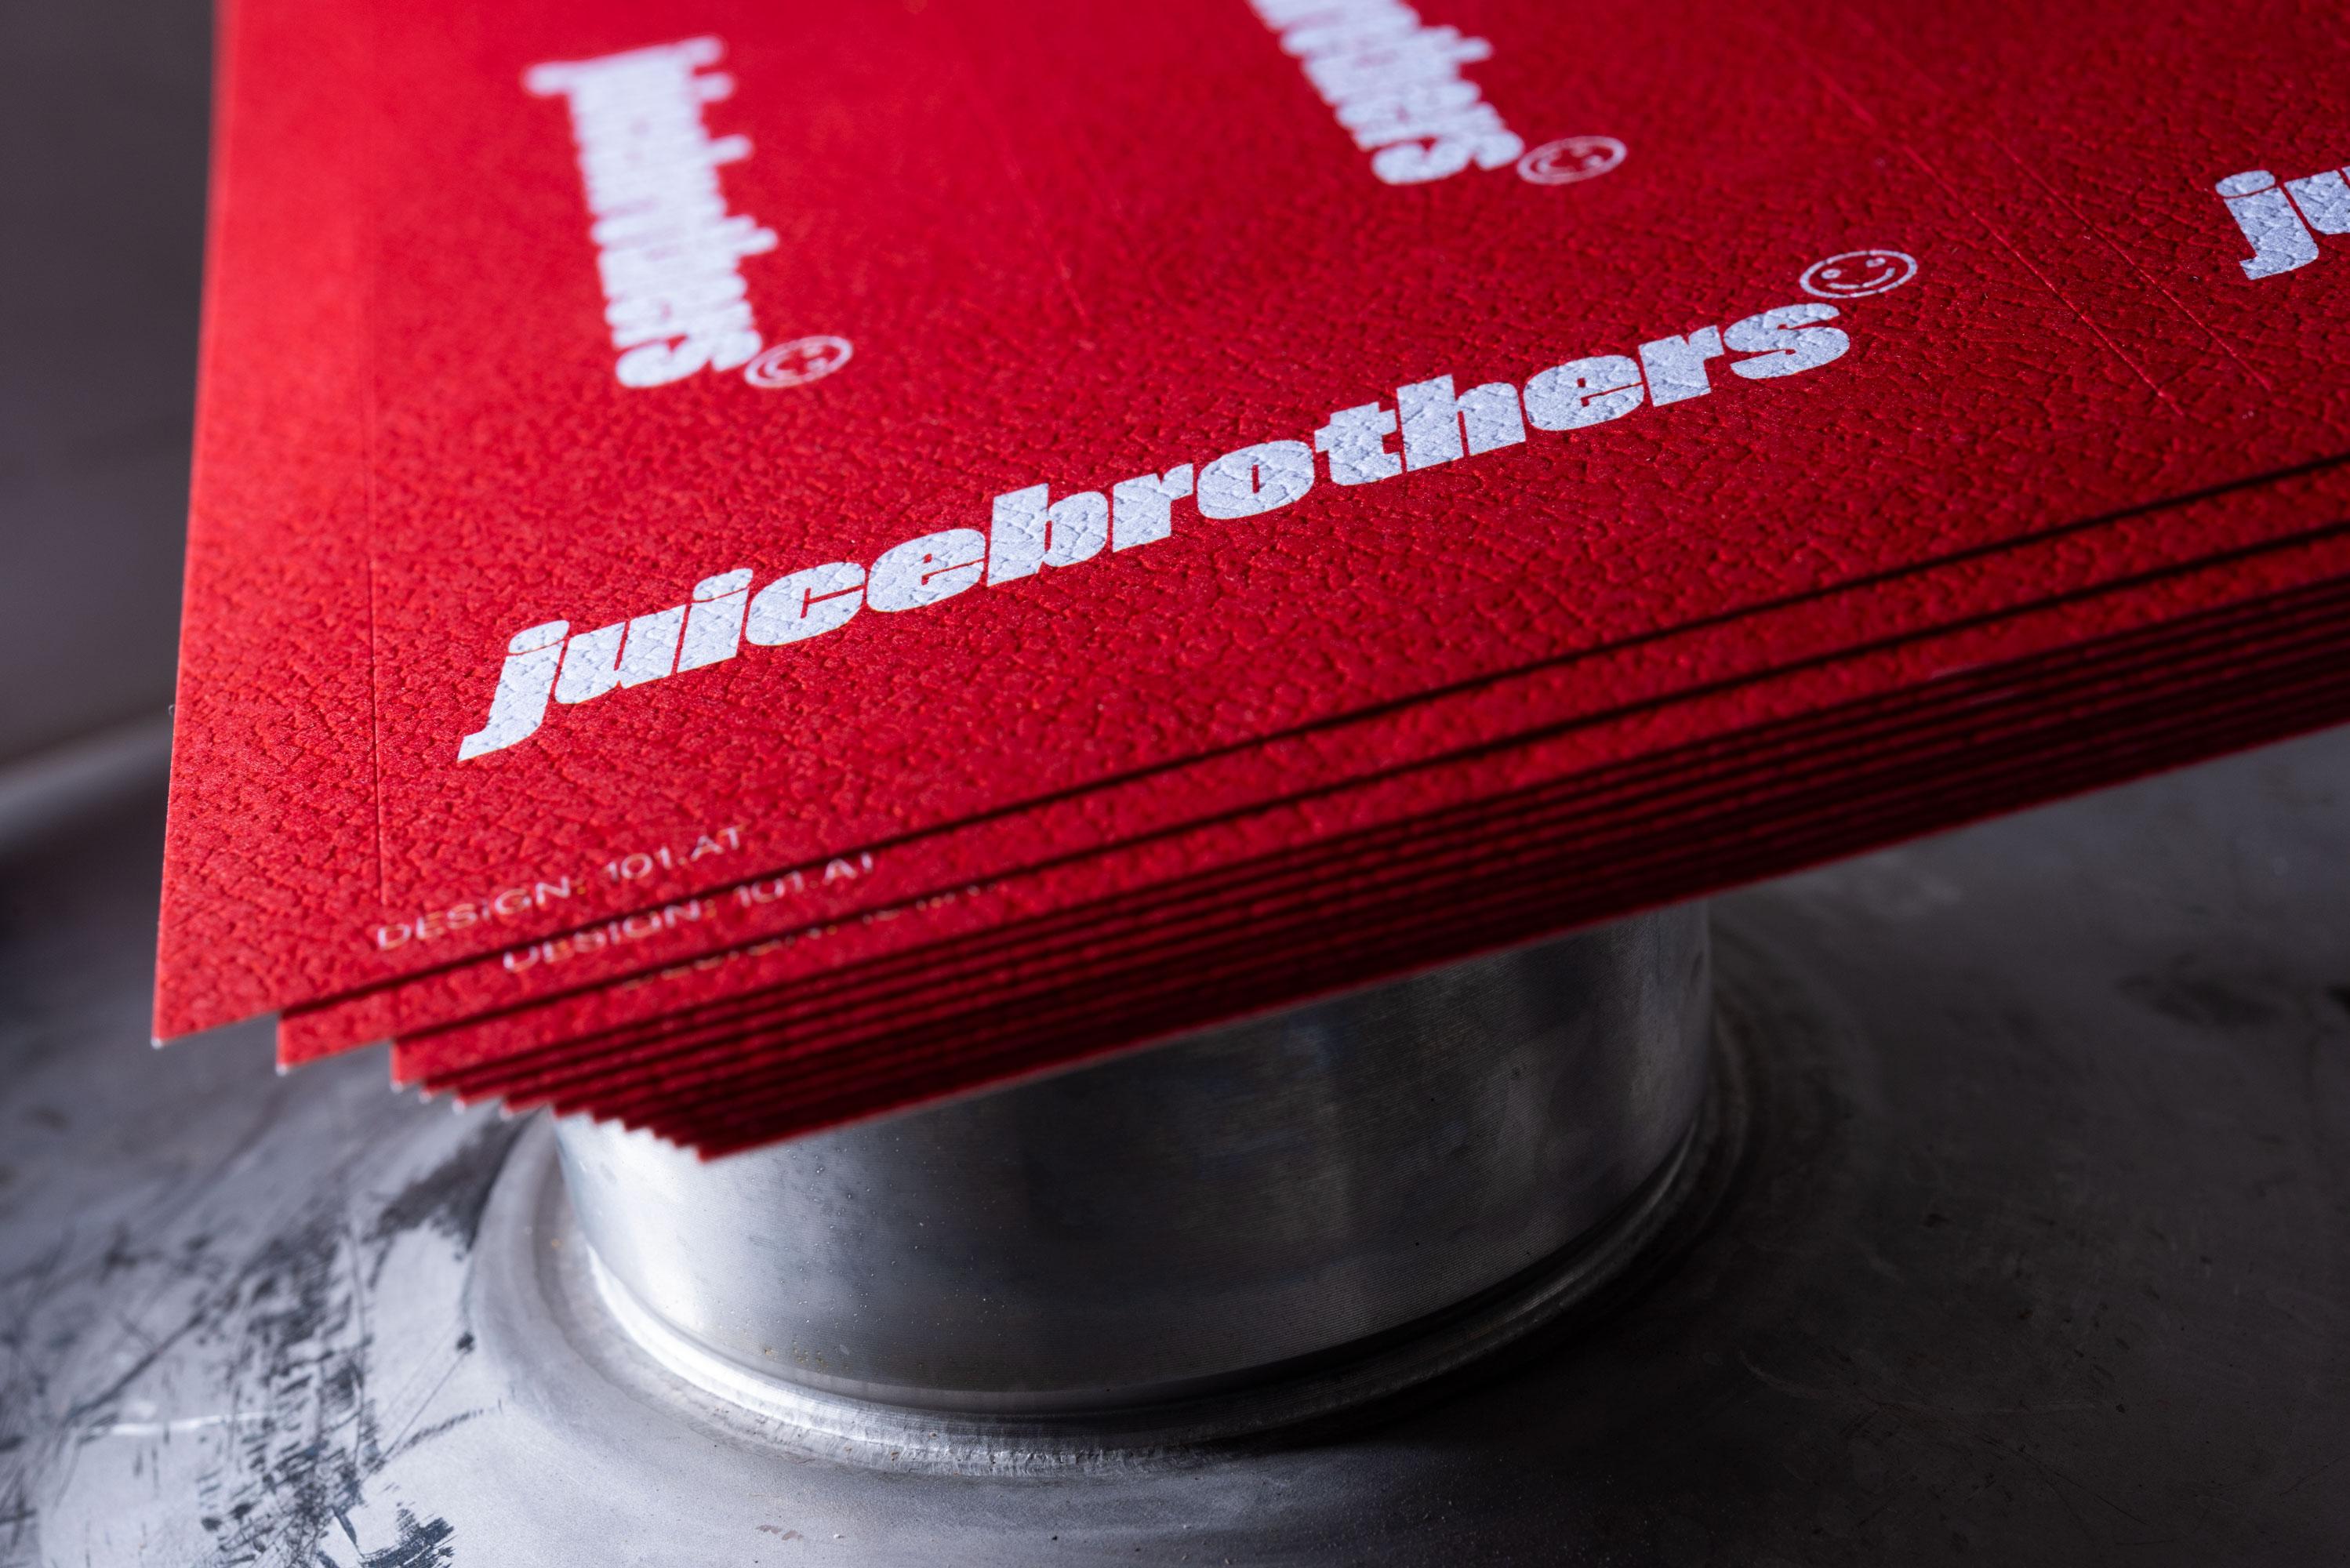 101 –Juicebrothers Branding